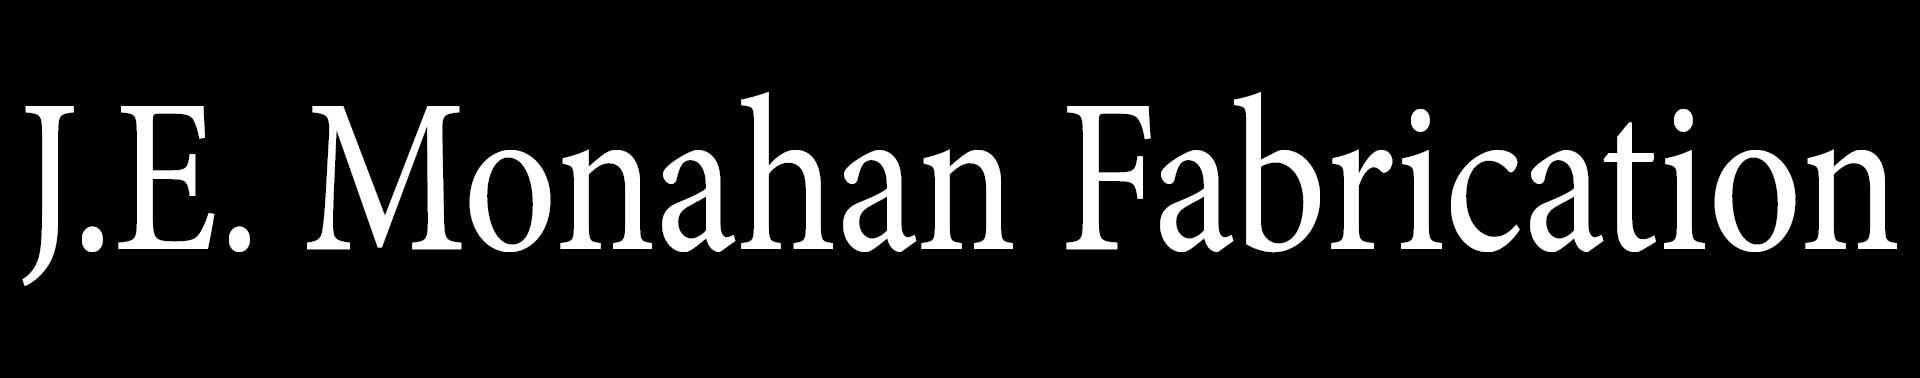 J.E. Monahan Fabrication